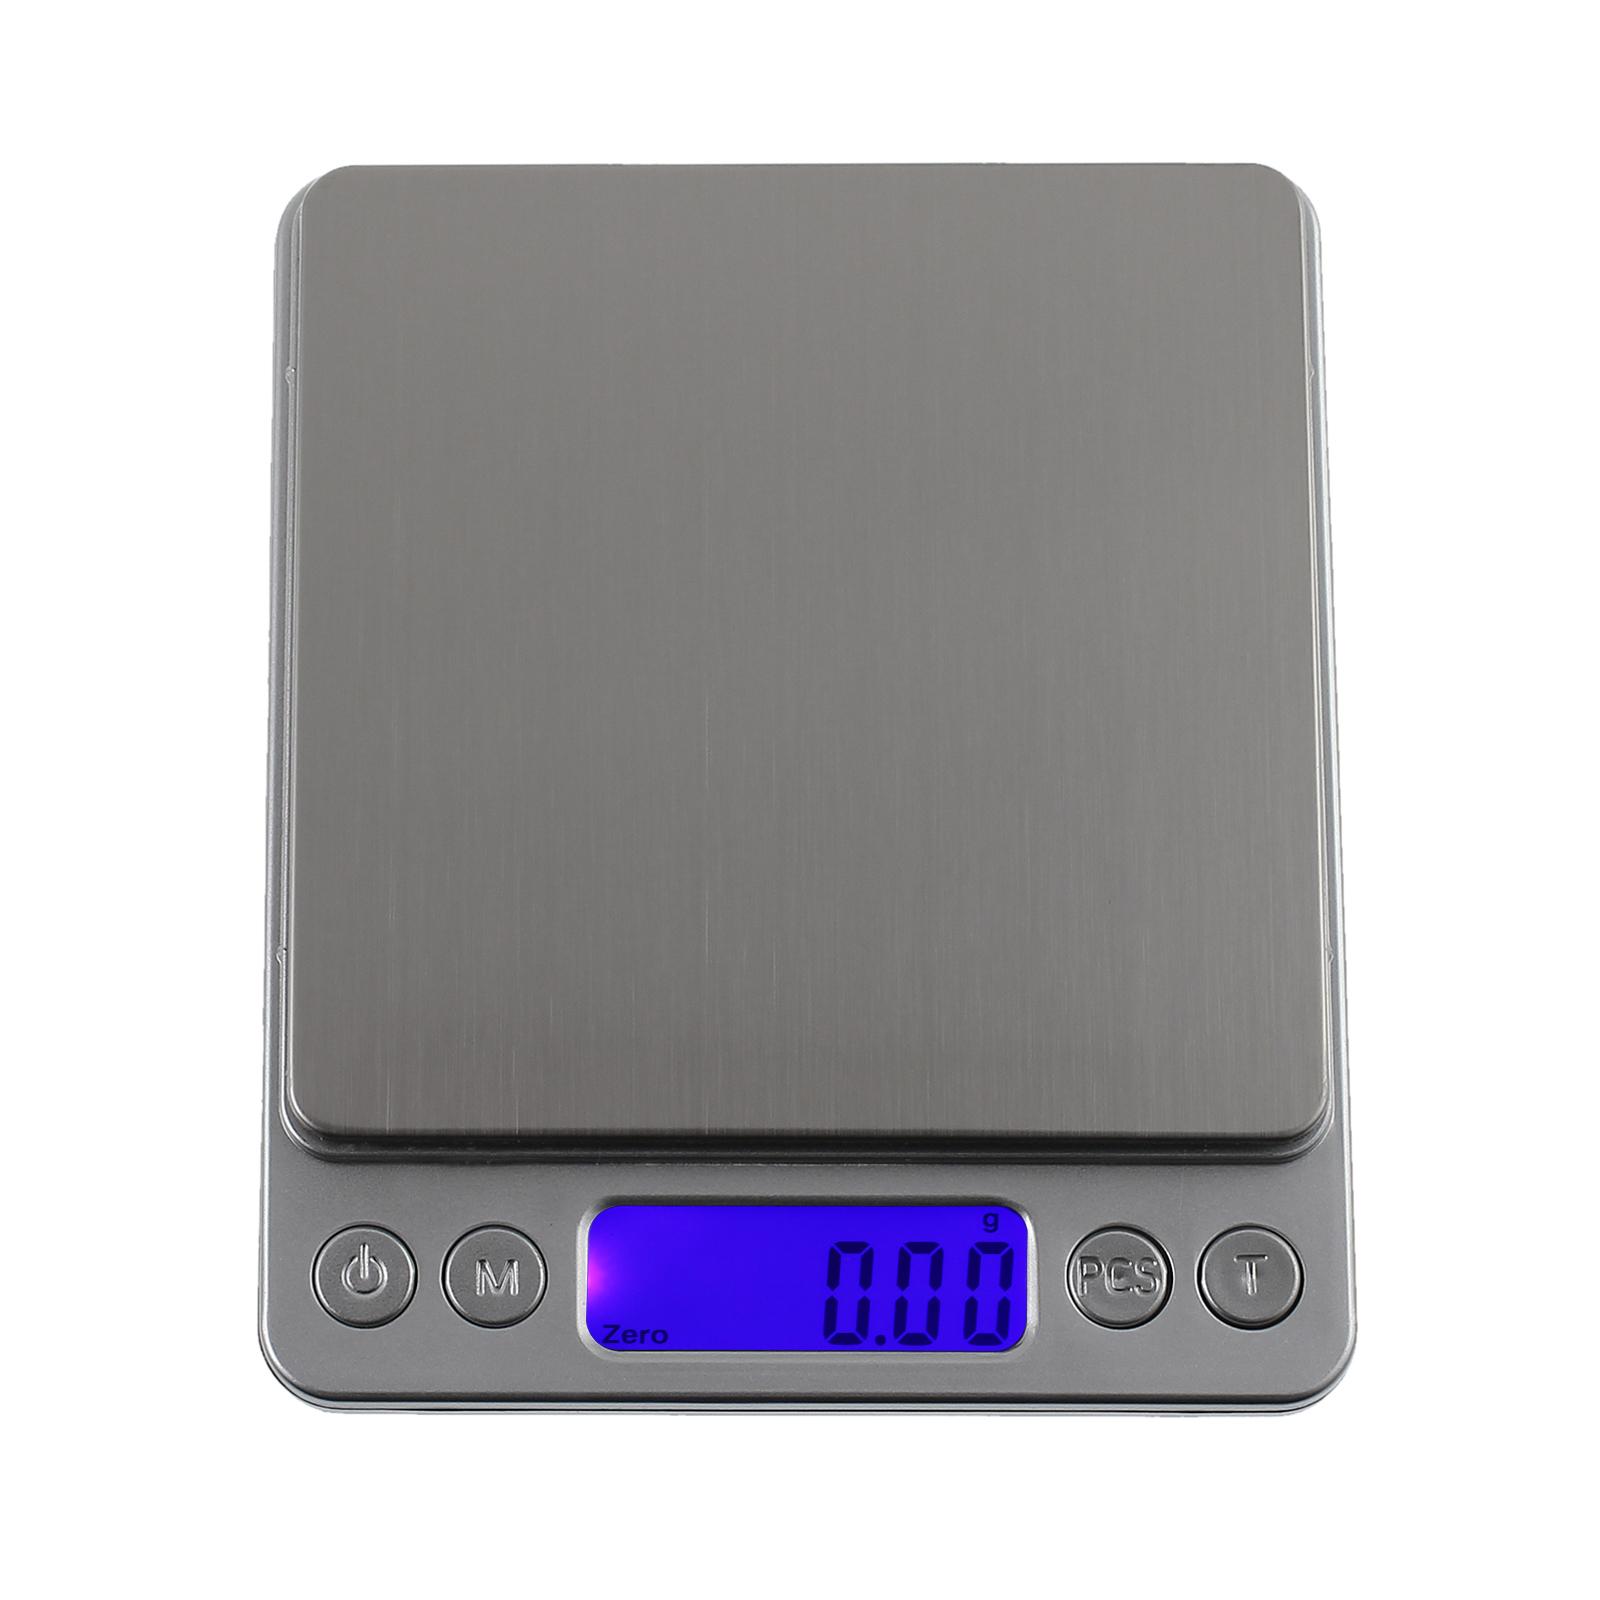 500g x 0.01g Digital Gram Skala Schmuck Gewicht Elektronische Waag Fw